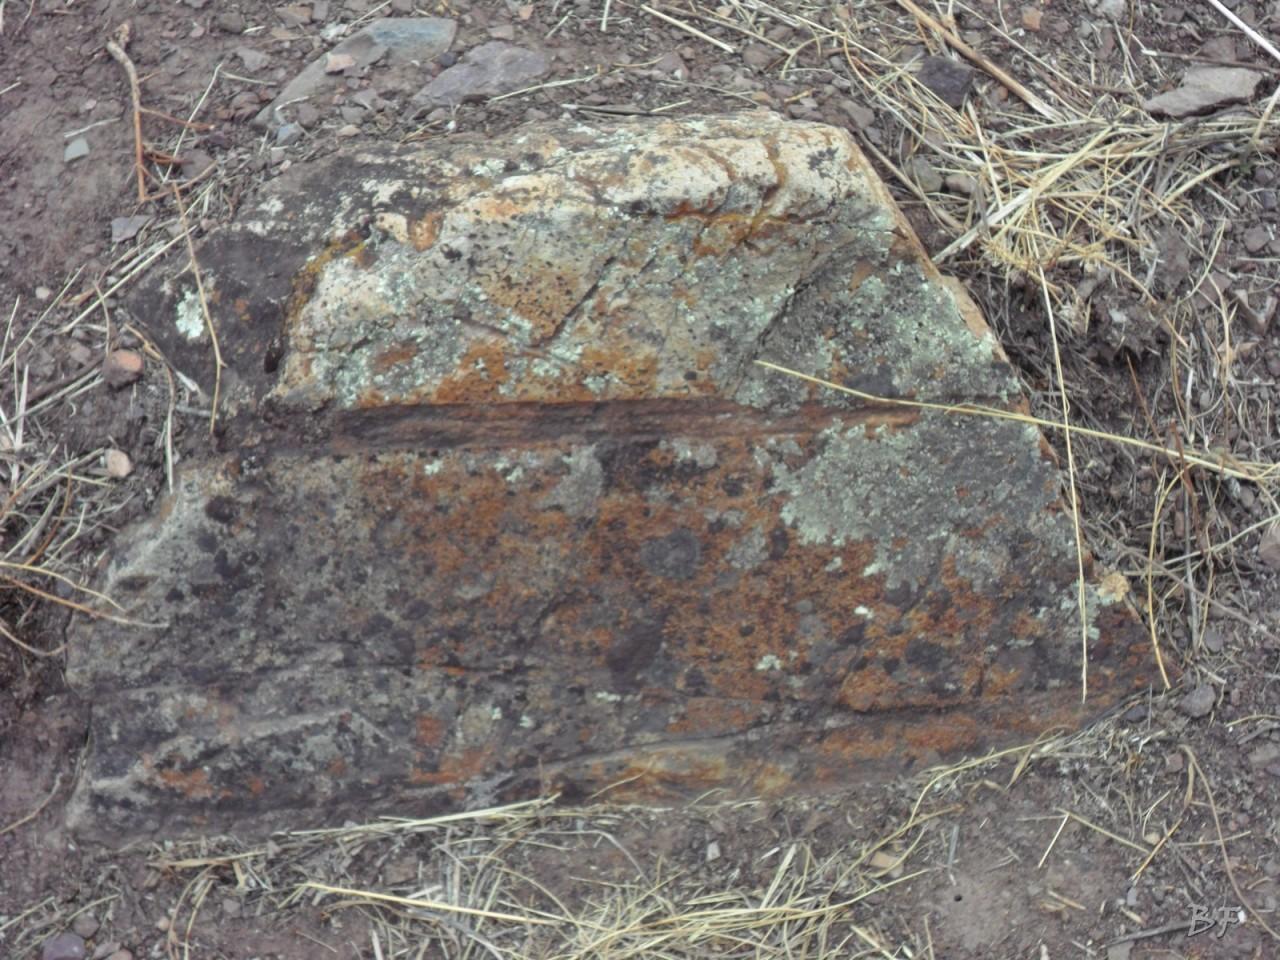 Mura-Poligonali-Megaliti-Altari-Rupestri-Pisac-Cusco-Perù-32